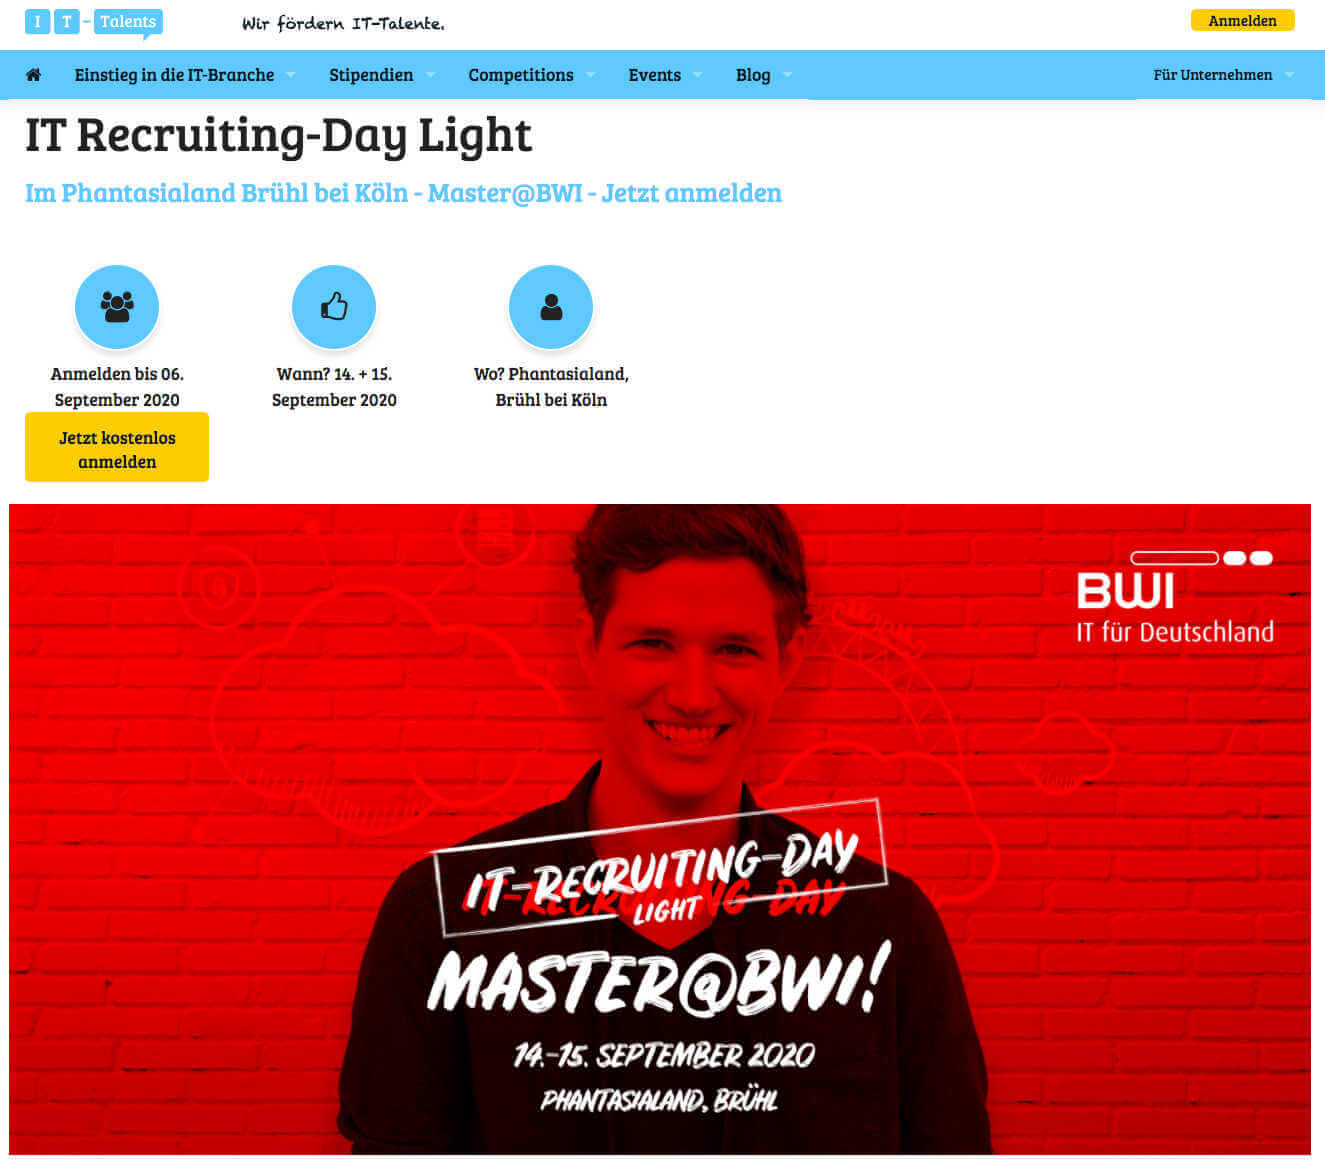 IT-Recruiting-Day-Light